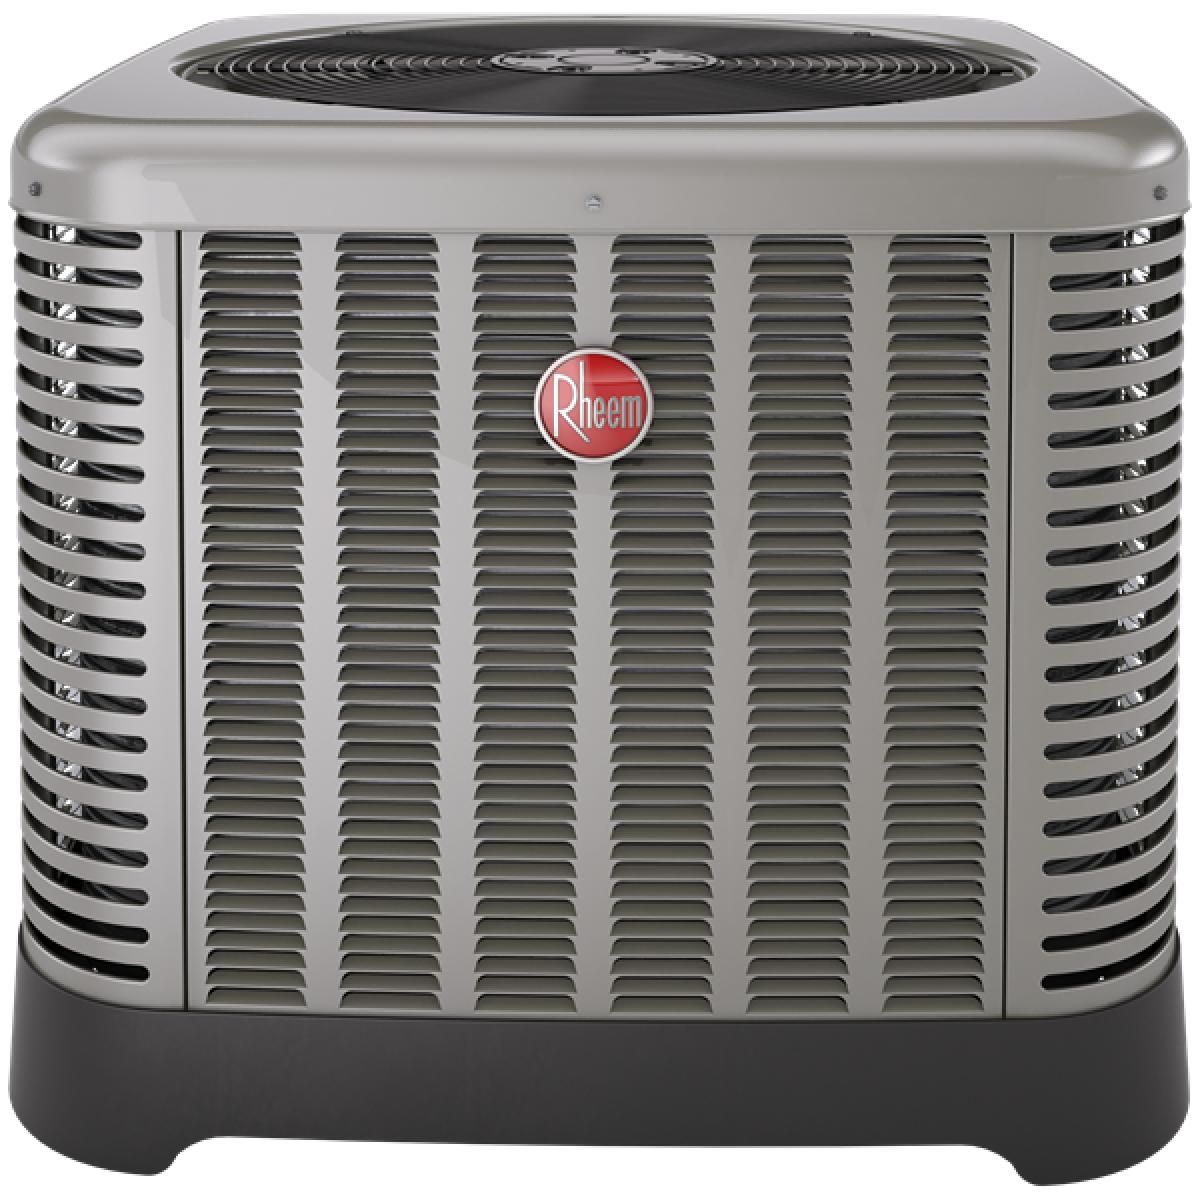 3.5 ton rheem 14 seer ra14 classic® series air conditioner in 3.5